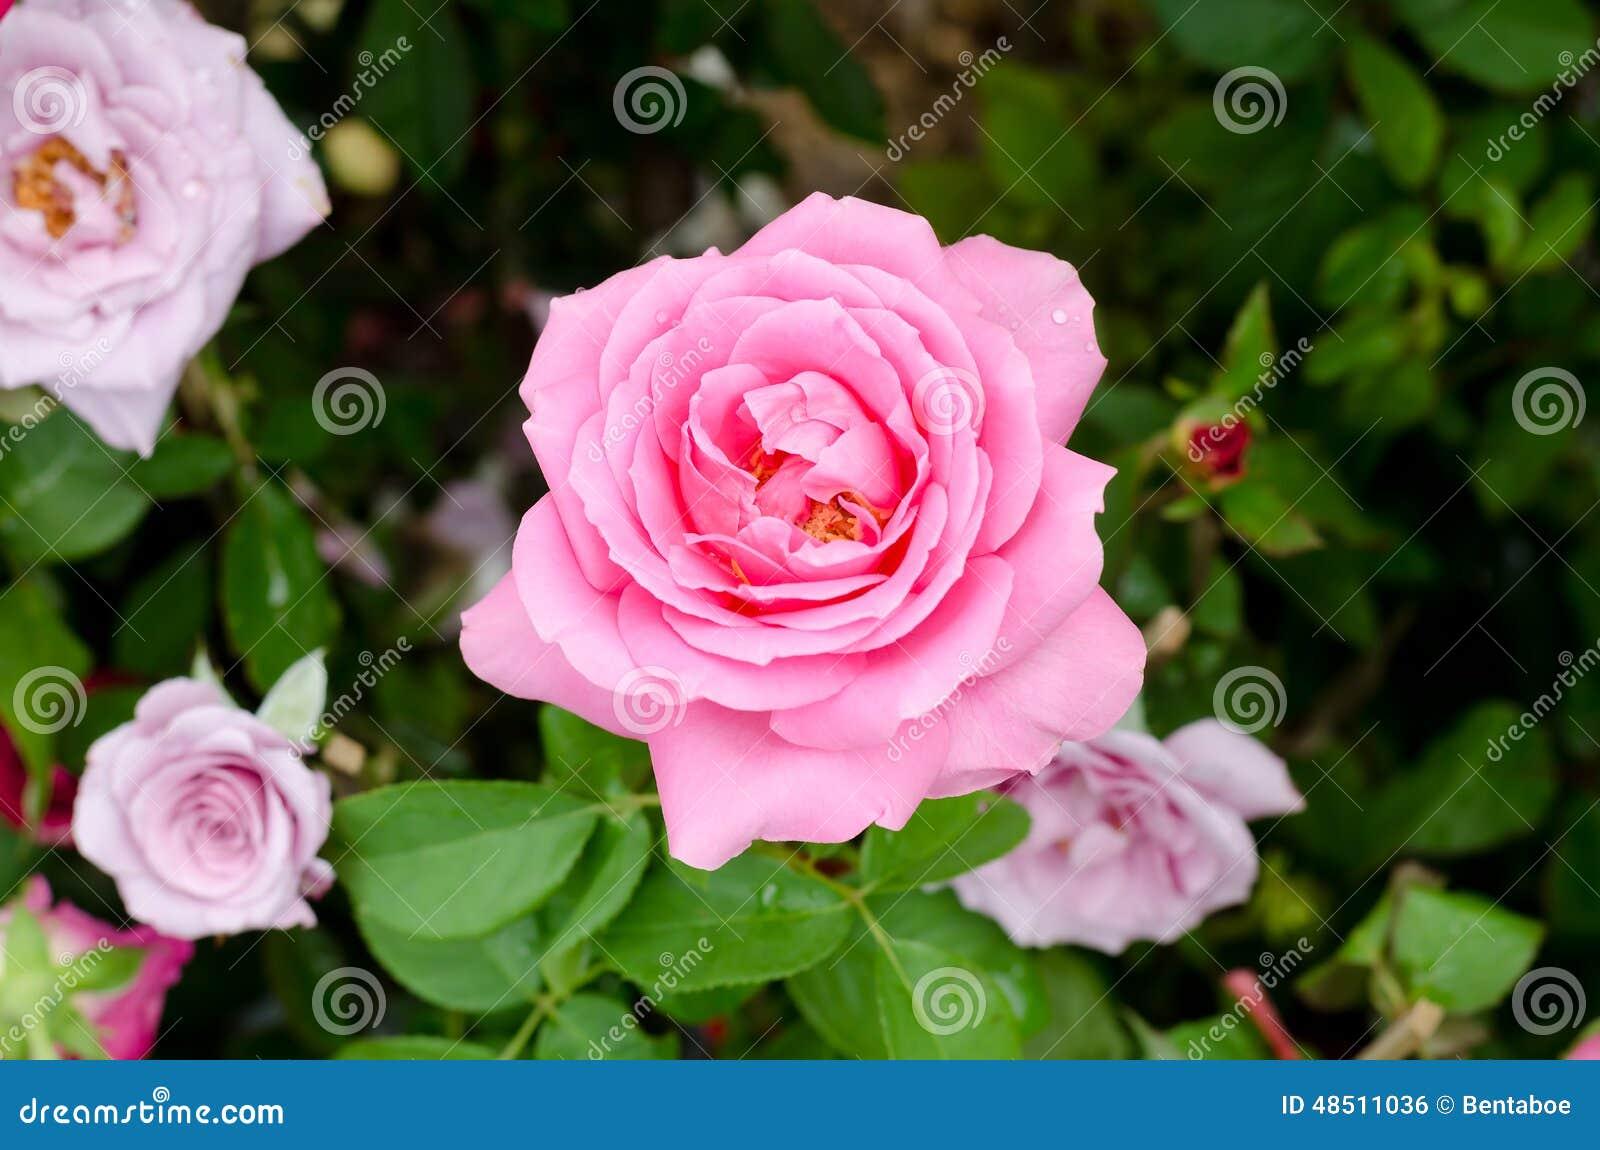 Beautiful Pink Rose Flower Stock Photo Image 48511036